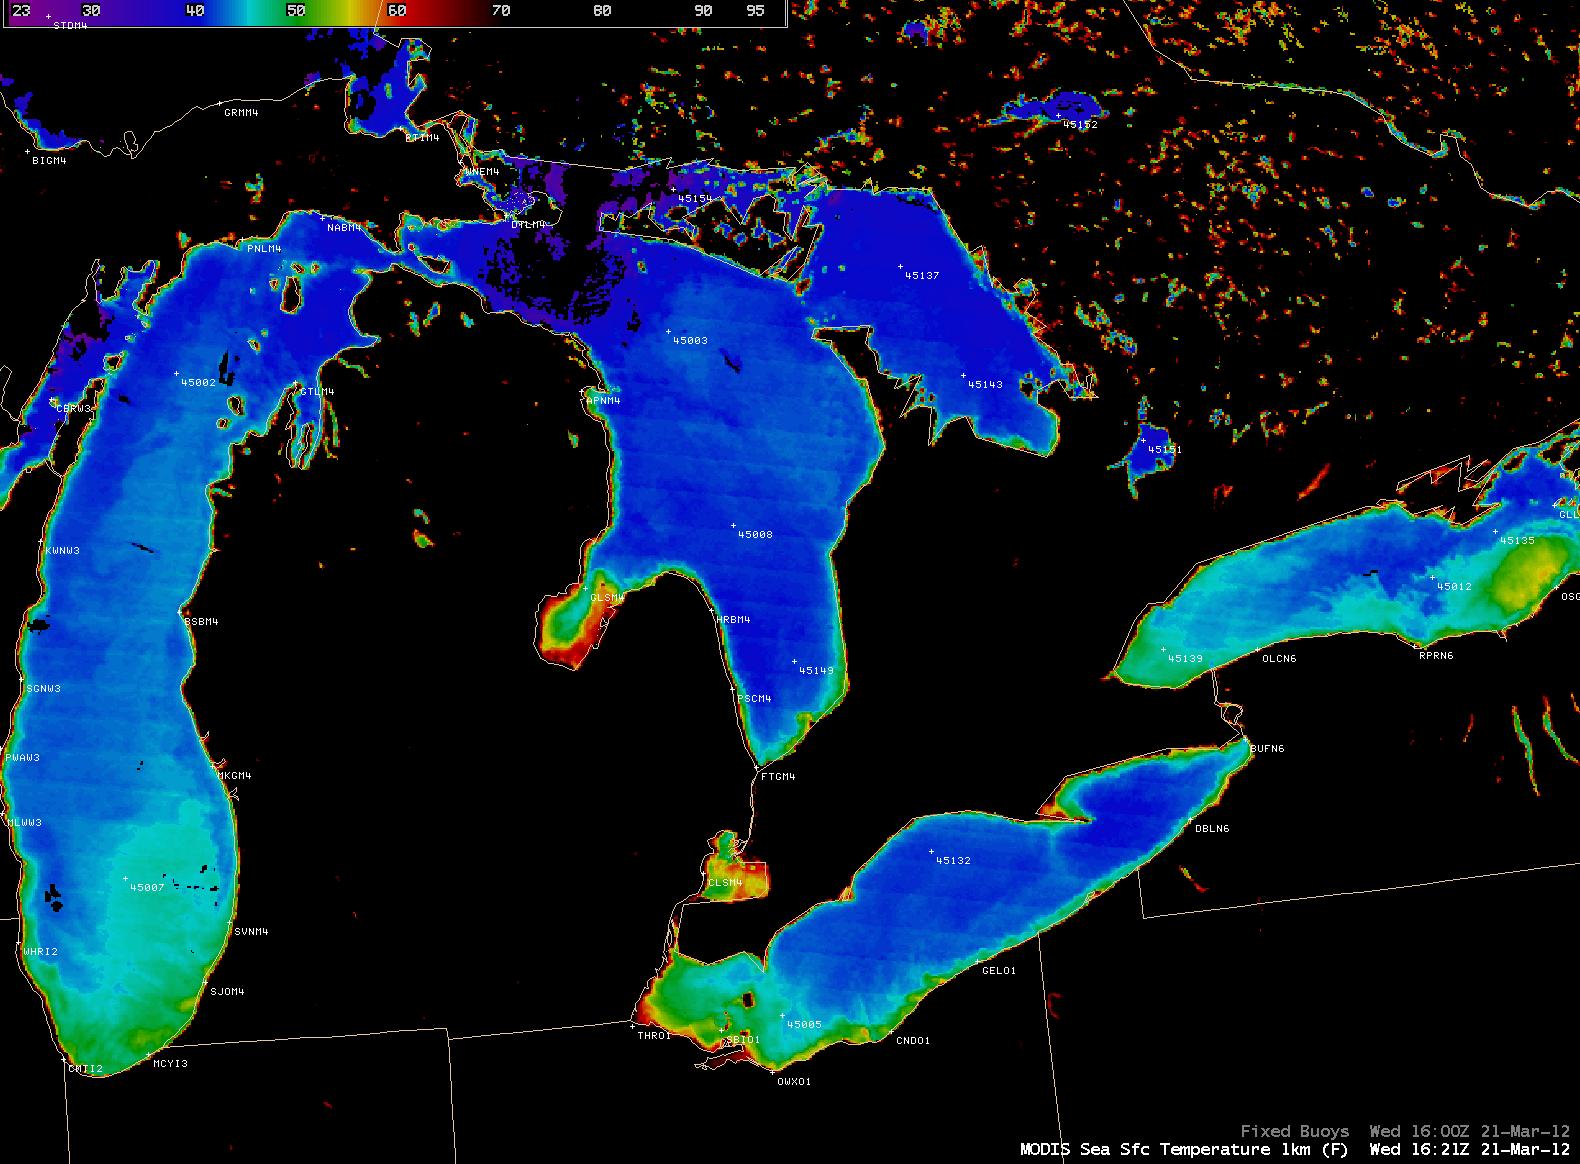 MODIS Sea Surface Temperature product